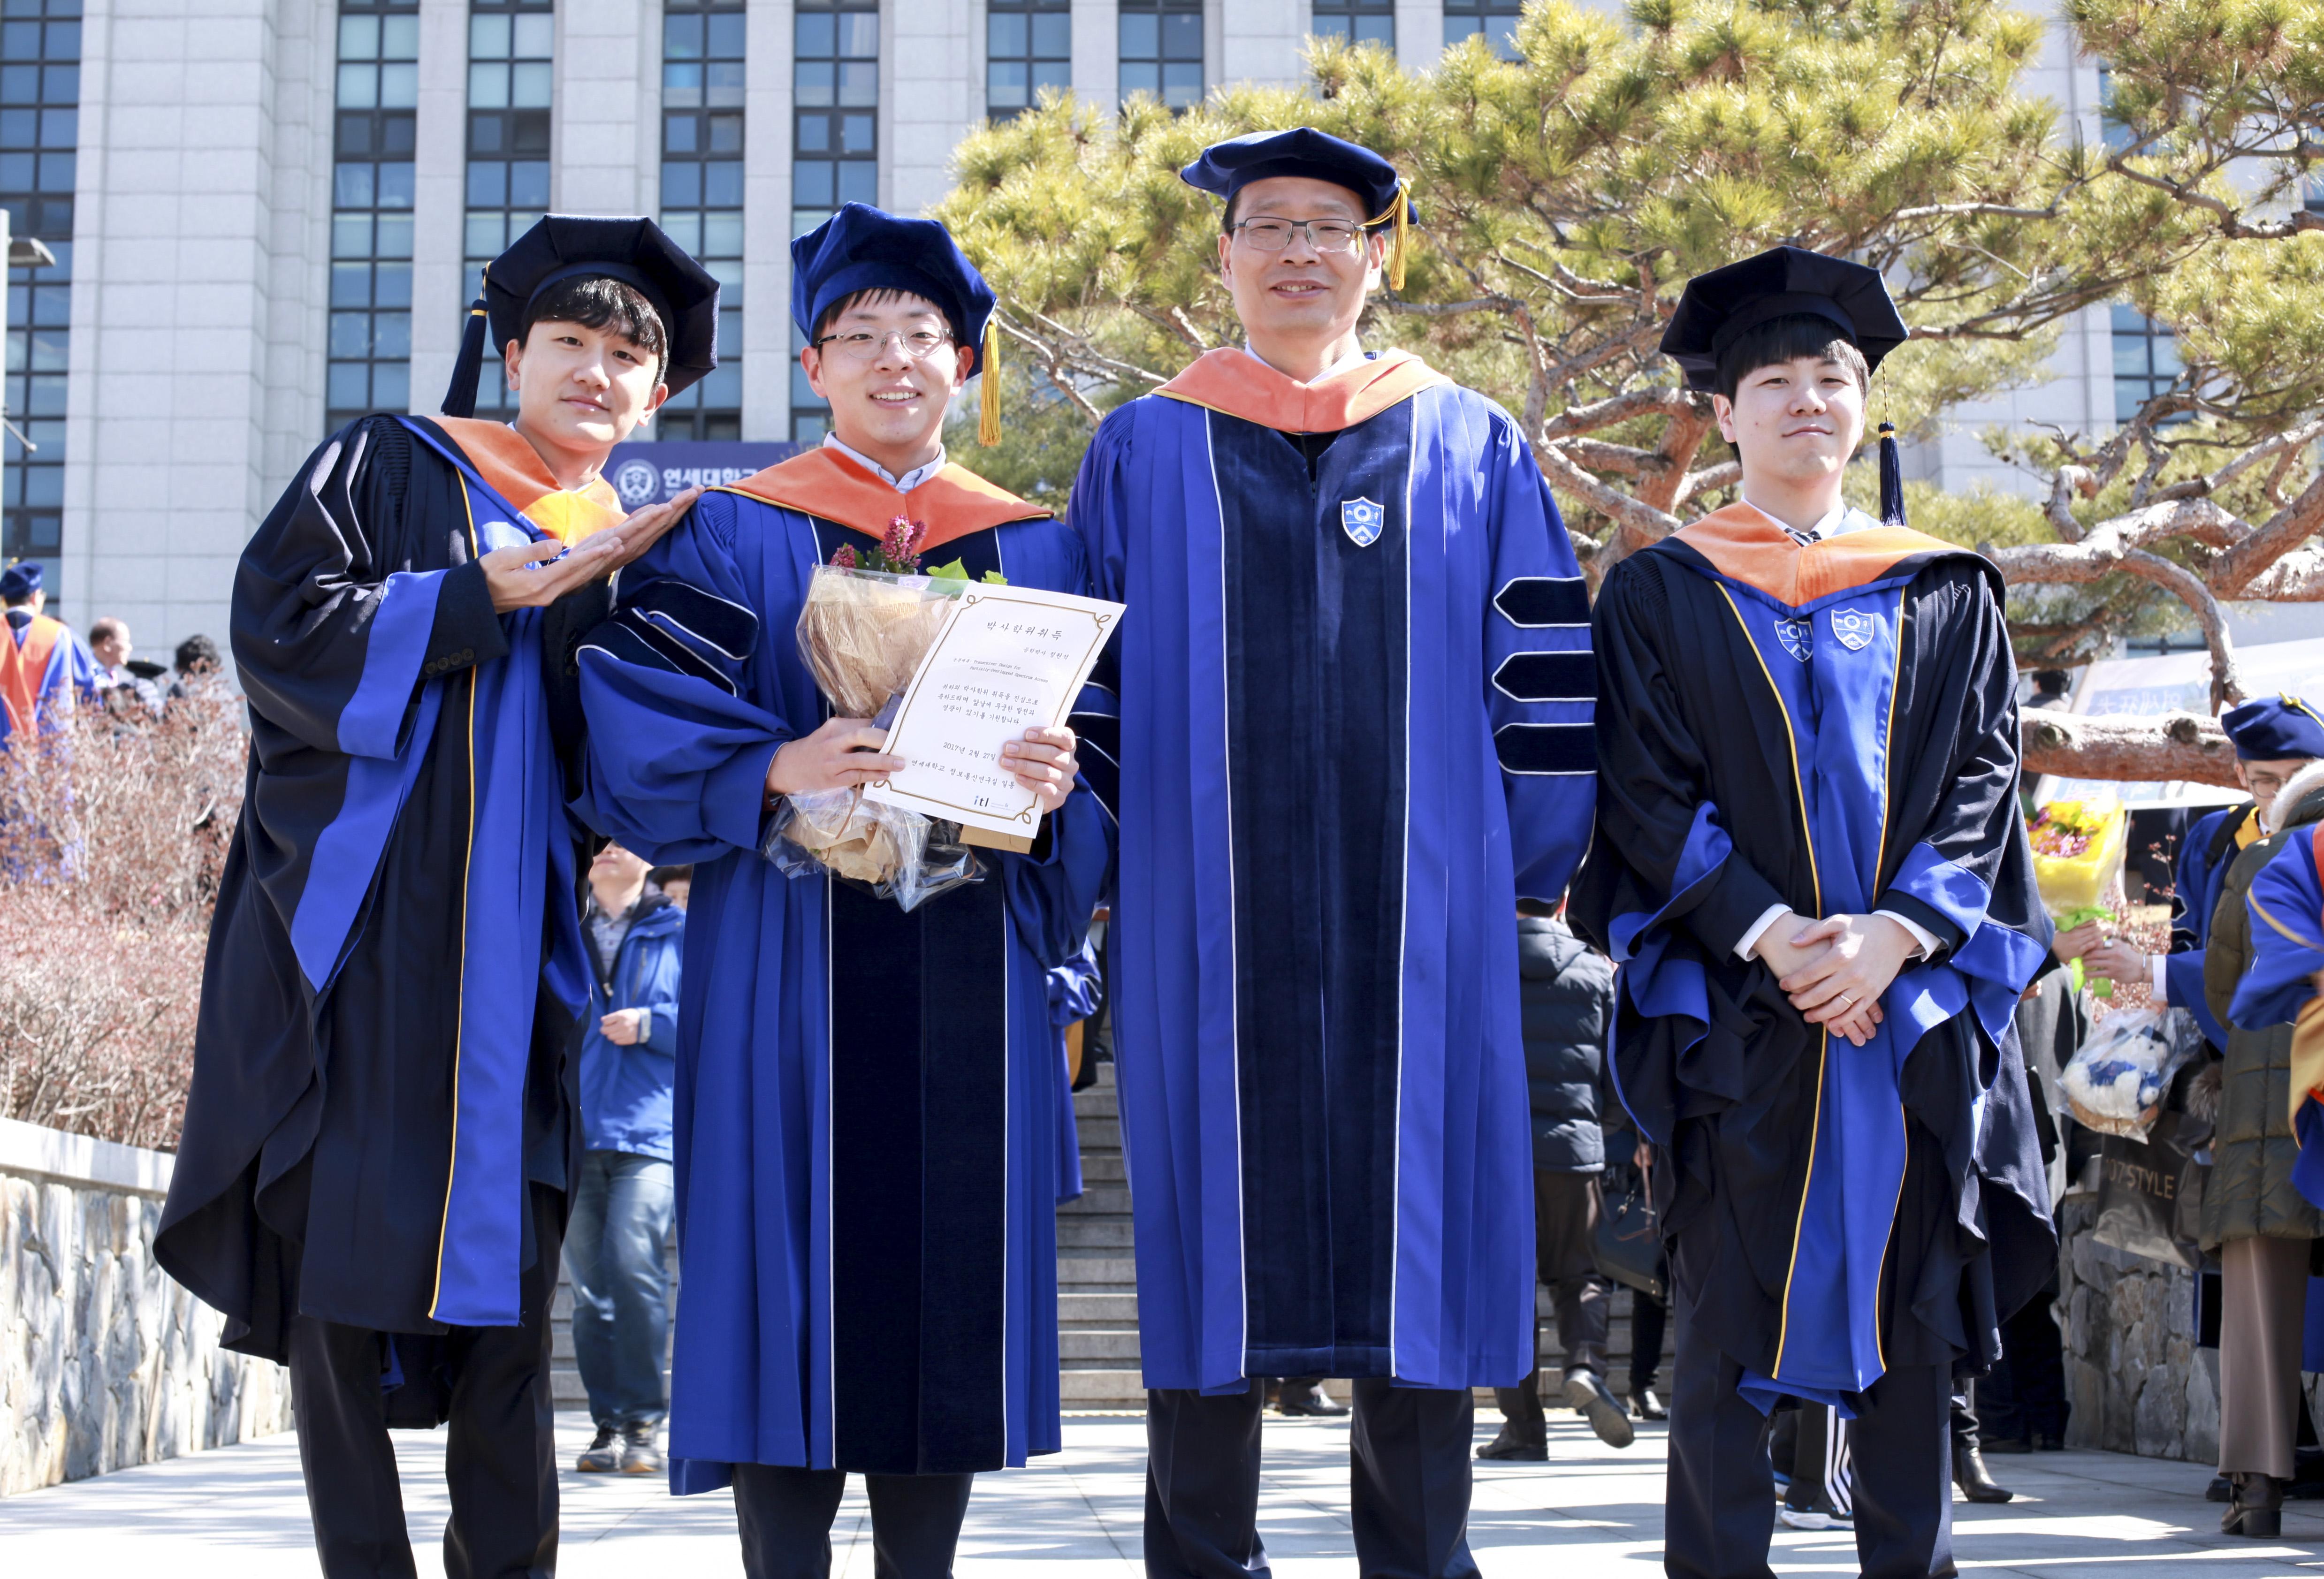 20170227_graduation_1.jpg